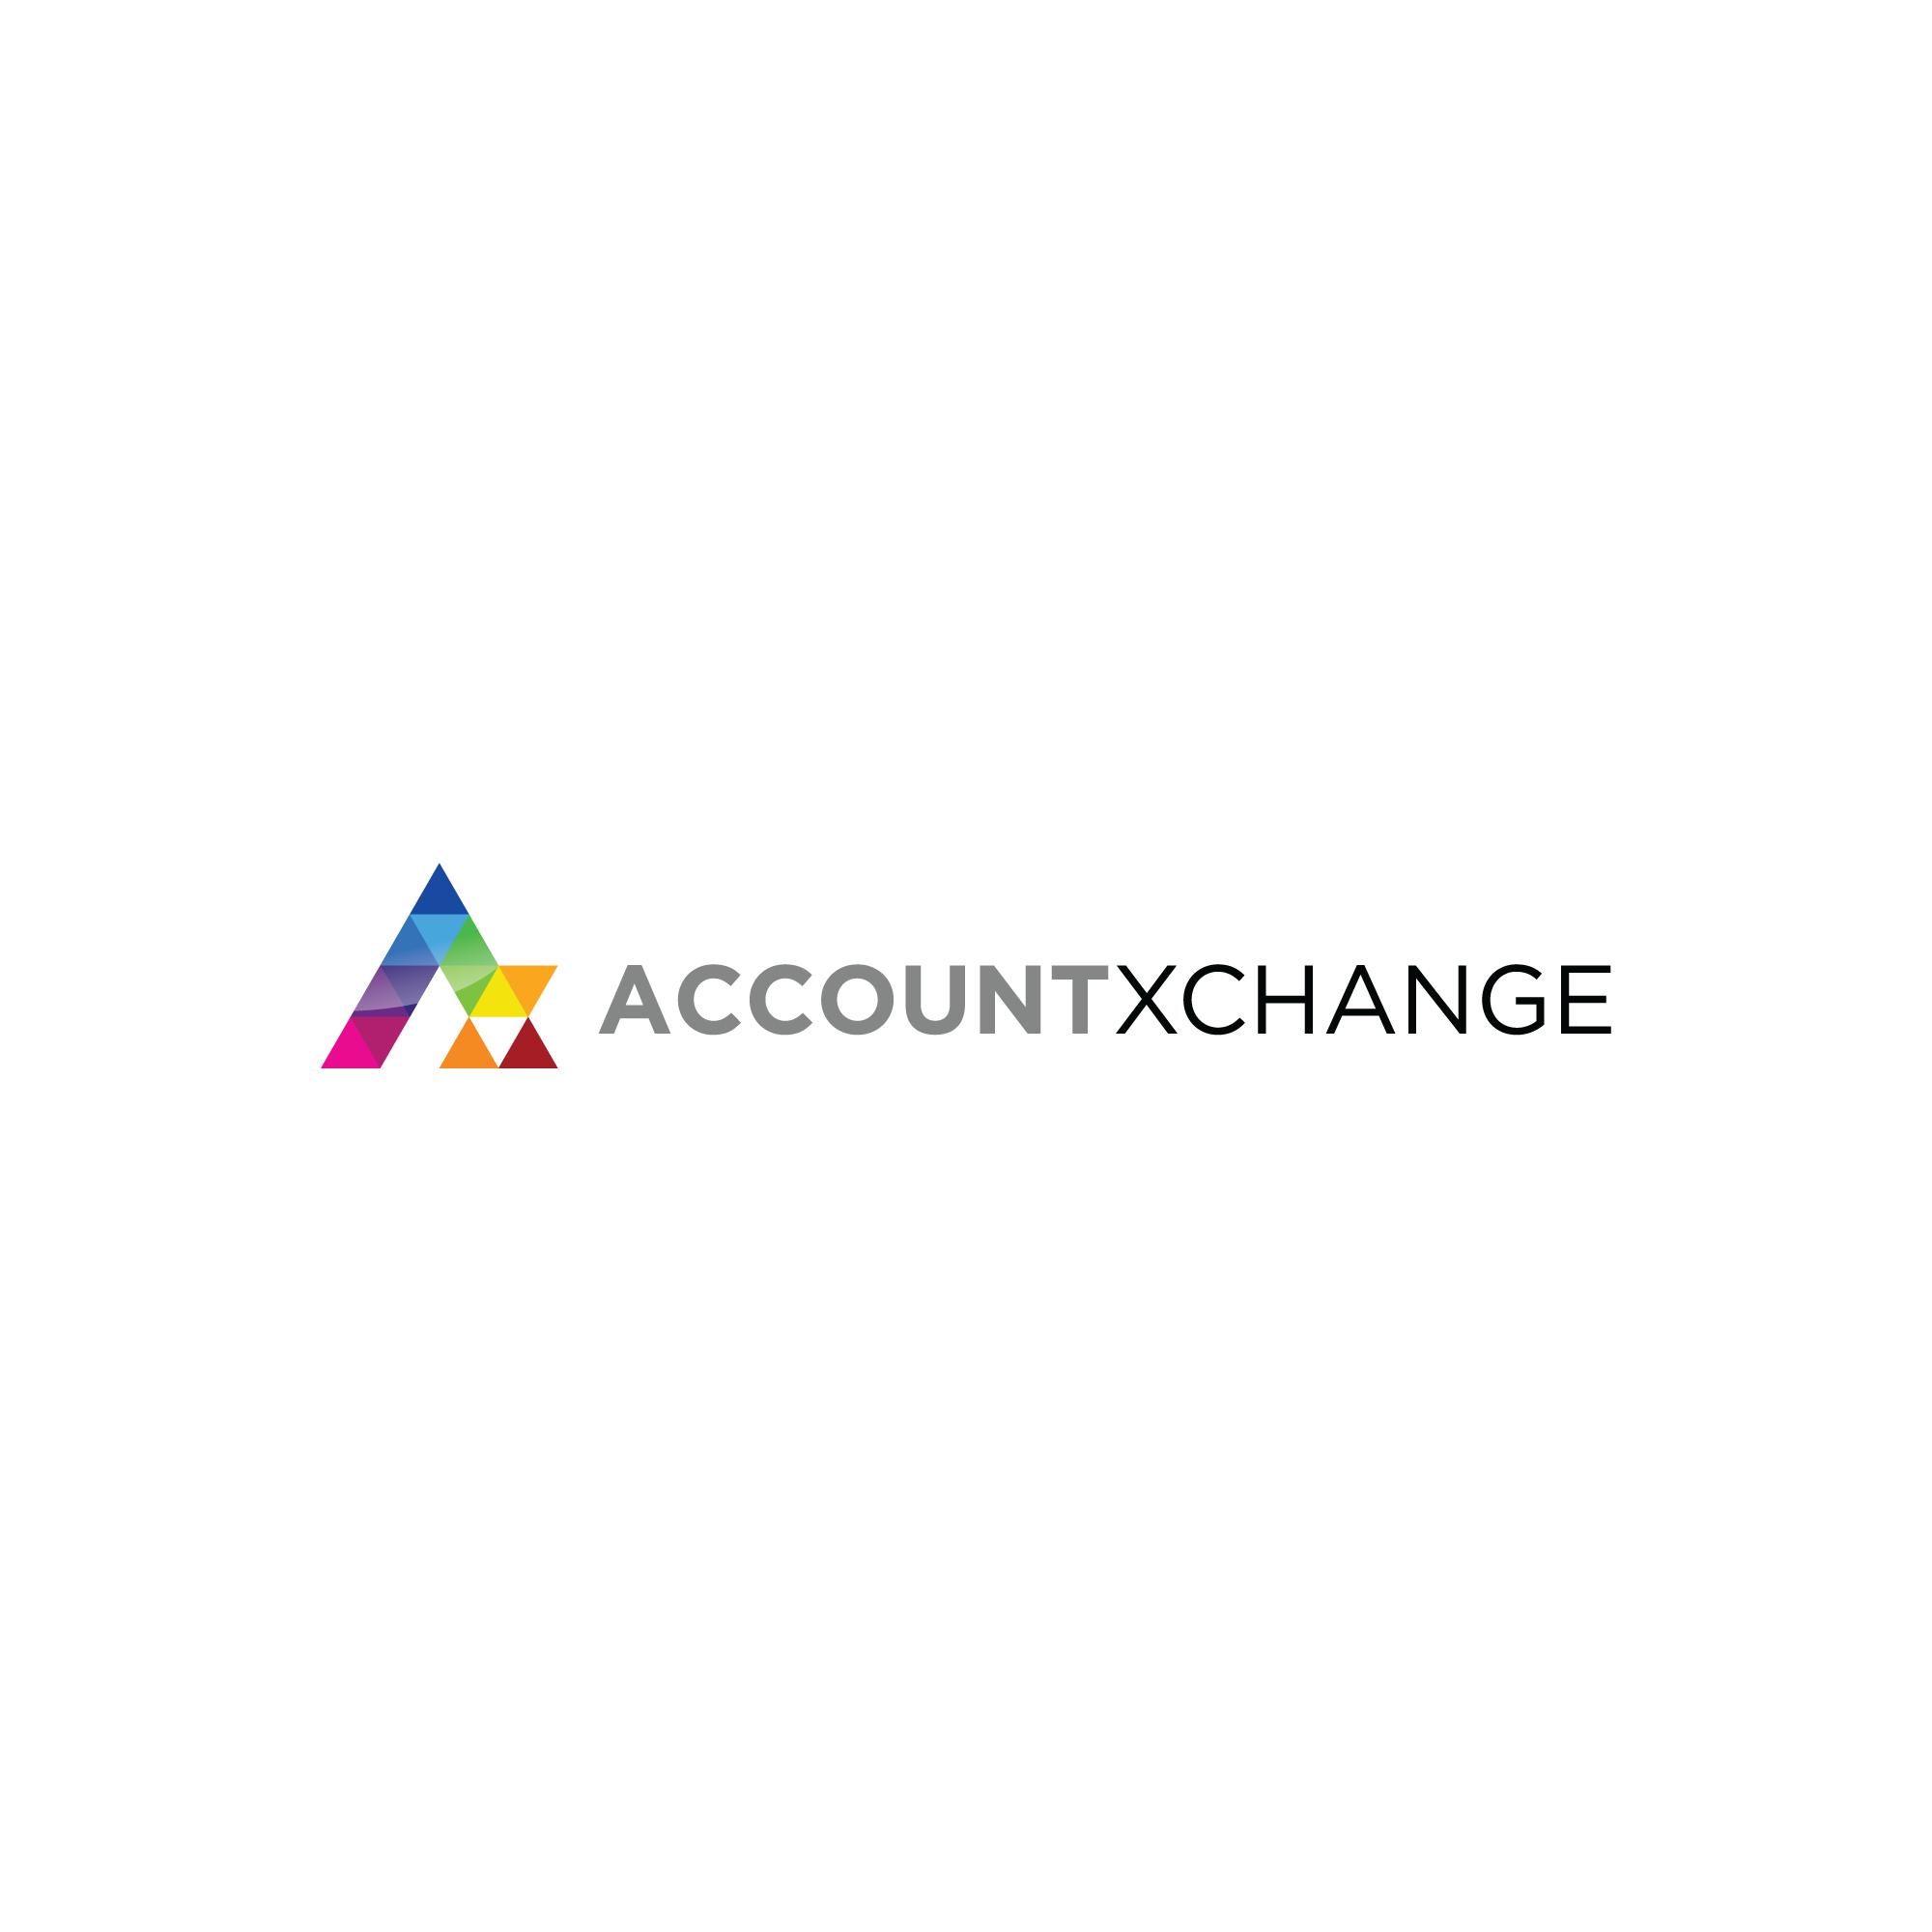 Design Our Social Media Account Rental Sites Logo